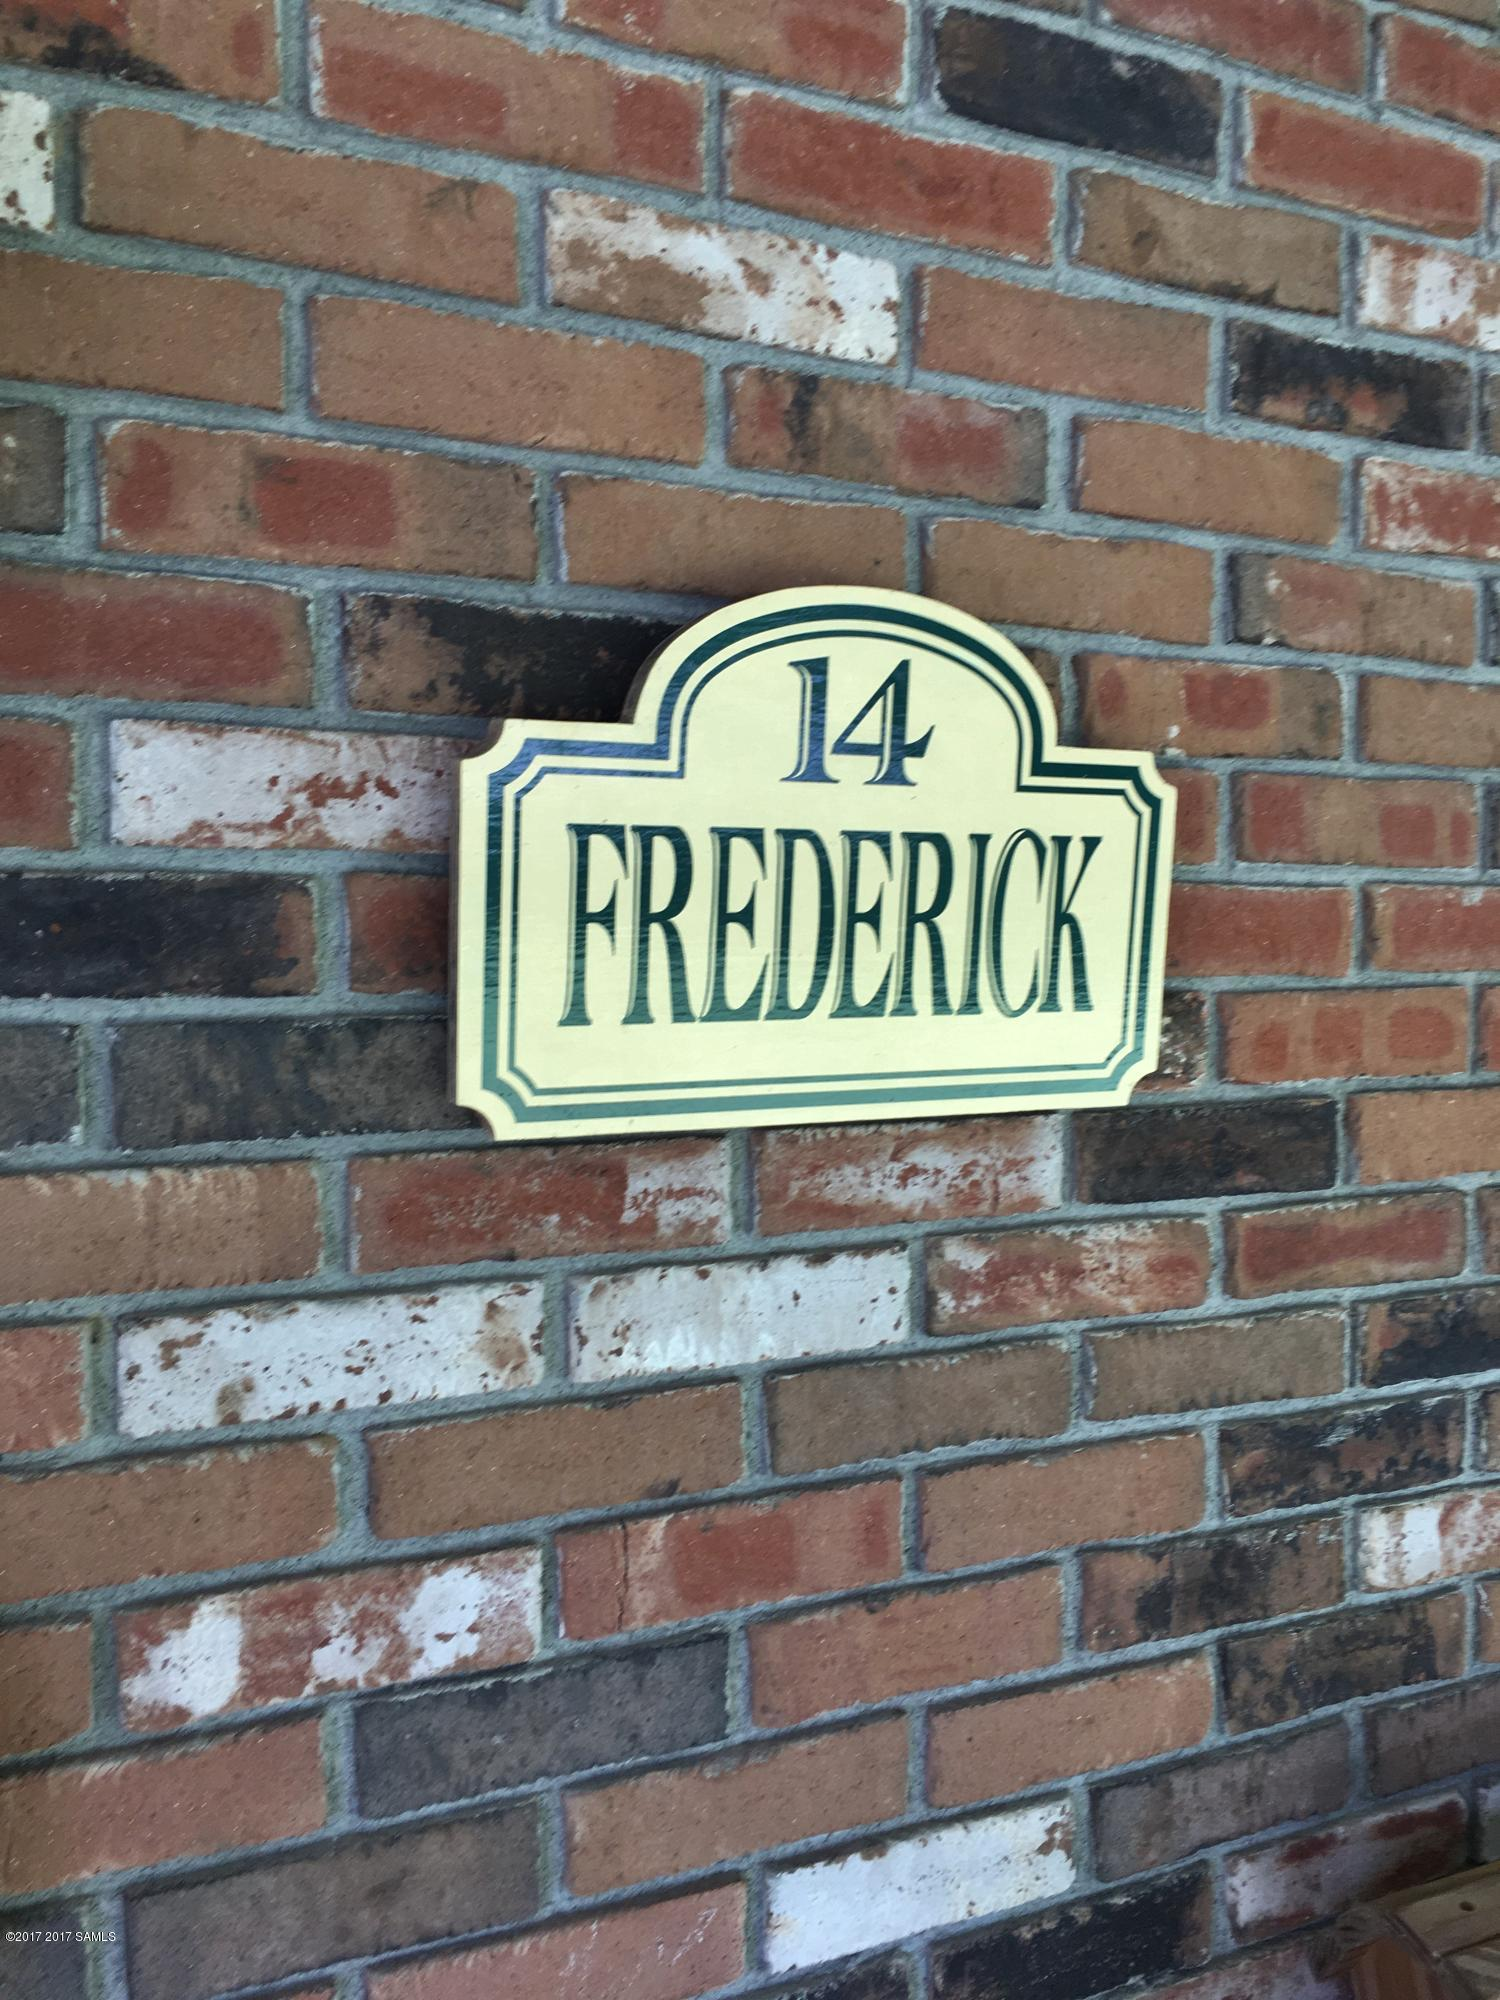 14 Frederick Drive, Fort Edward NY 12828 photo 2